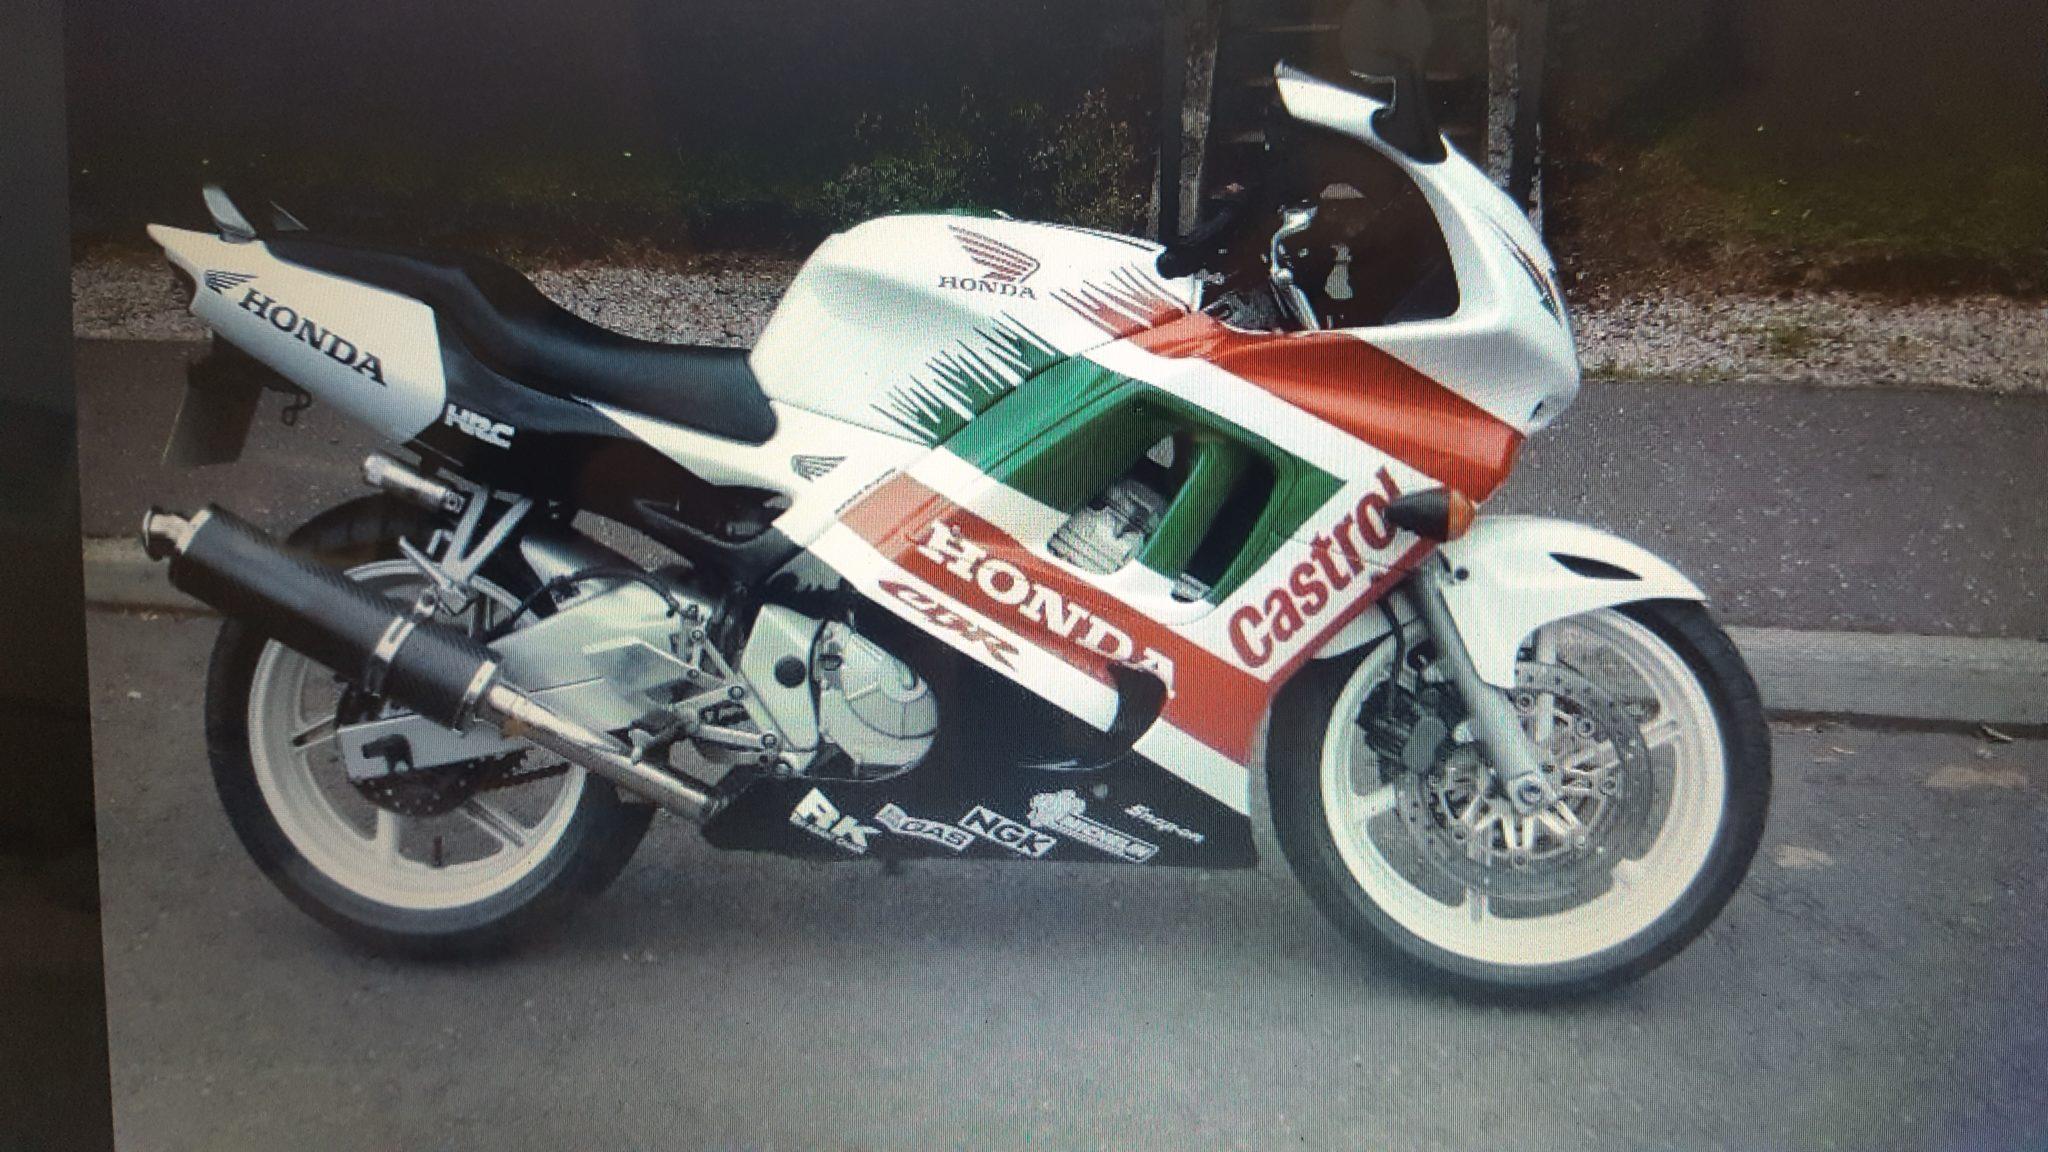 RAB – Honda CBR6005